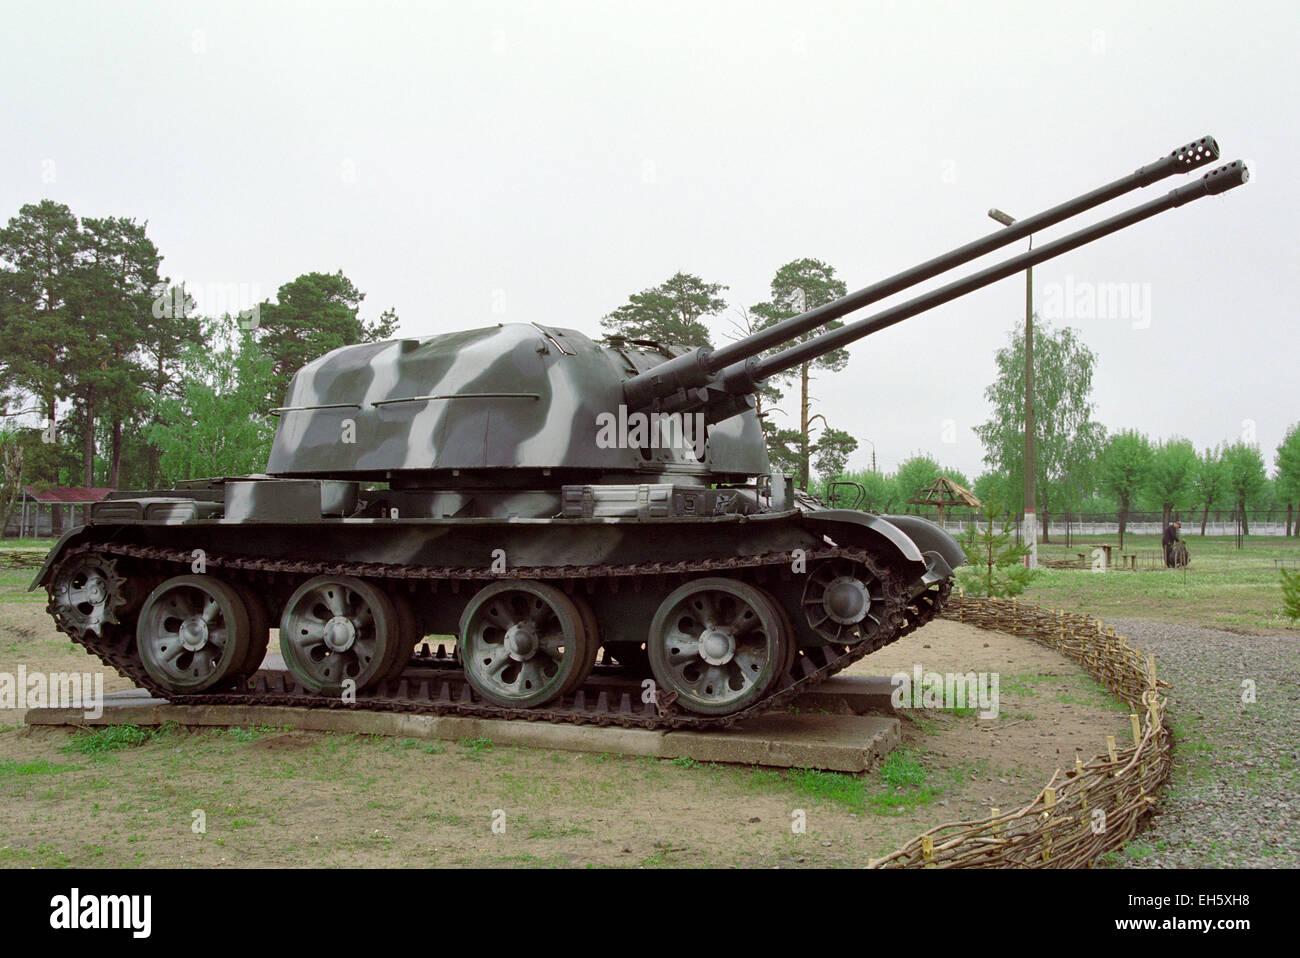 Gun, anti-aircraft self-propelled ZSU-2-57 - Stock Image